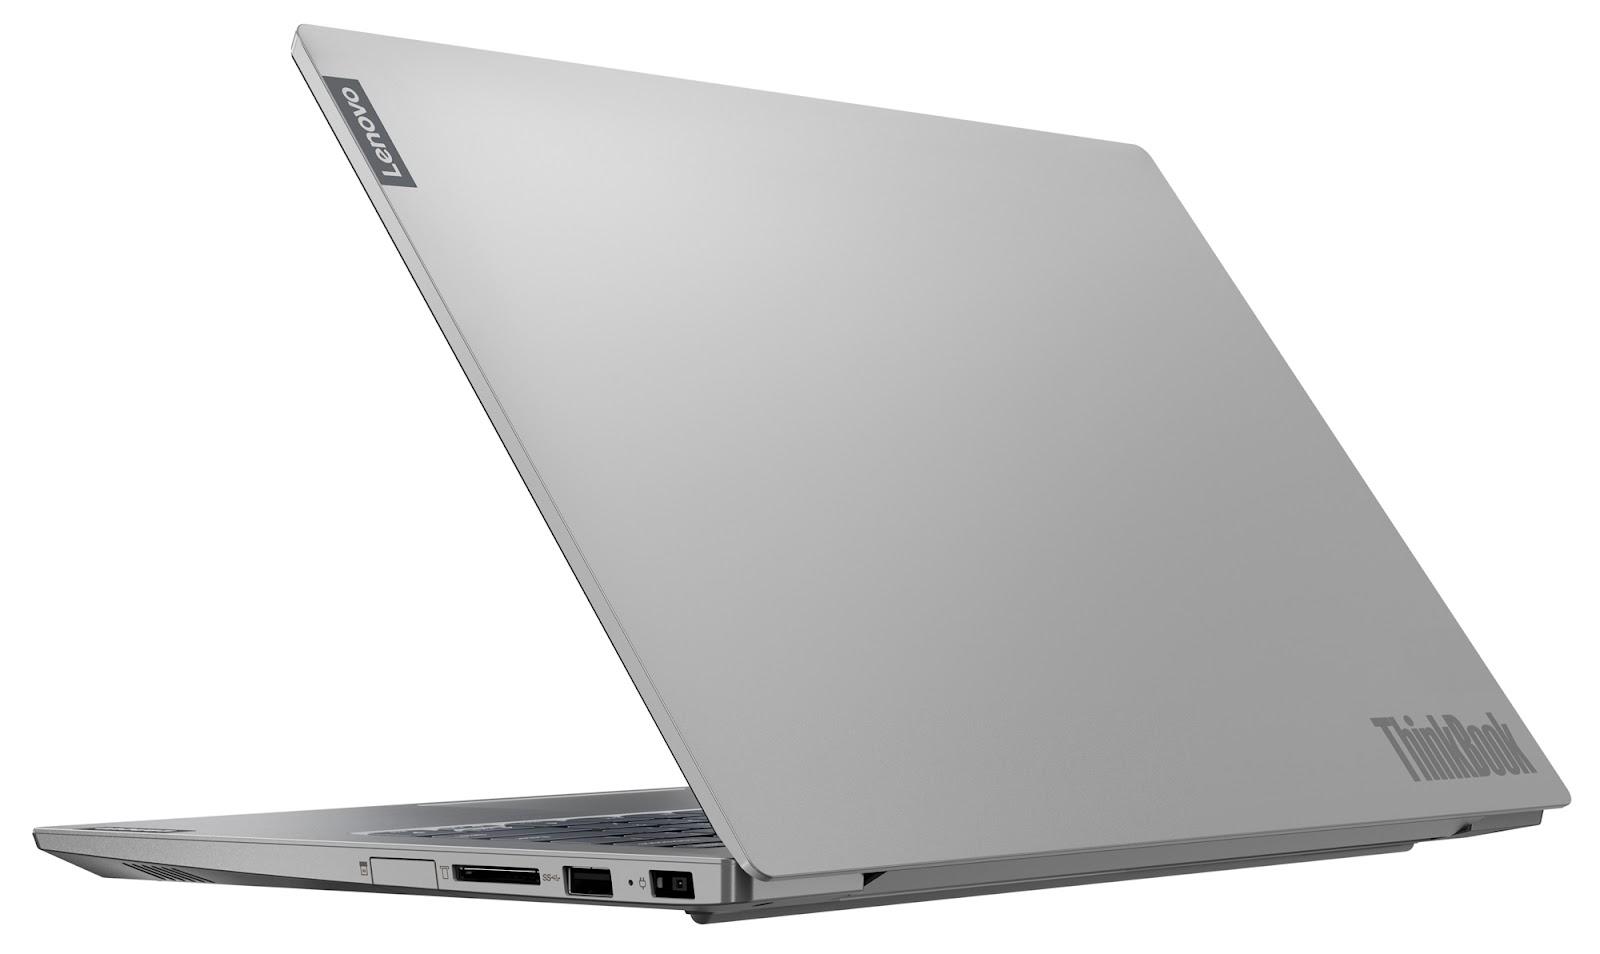 Фото 2. Ноутбук Lenovo ThinkBook 14 IIL (20SL00F6RU)